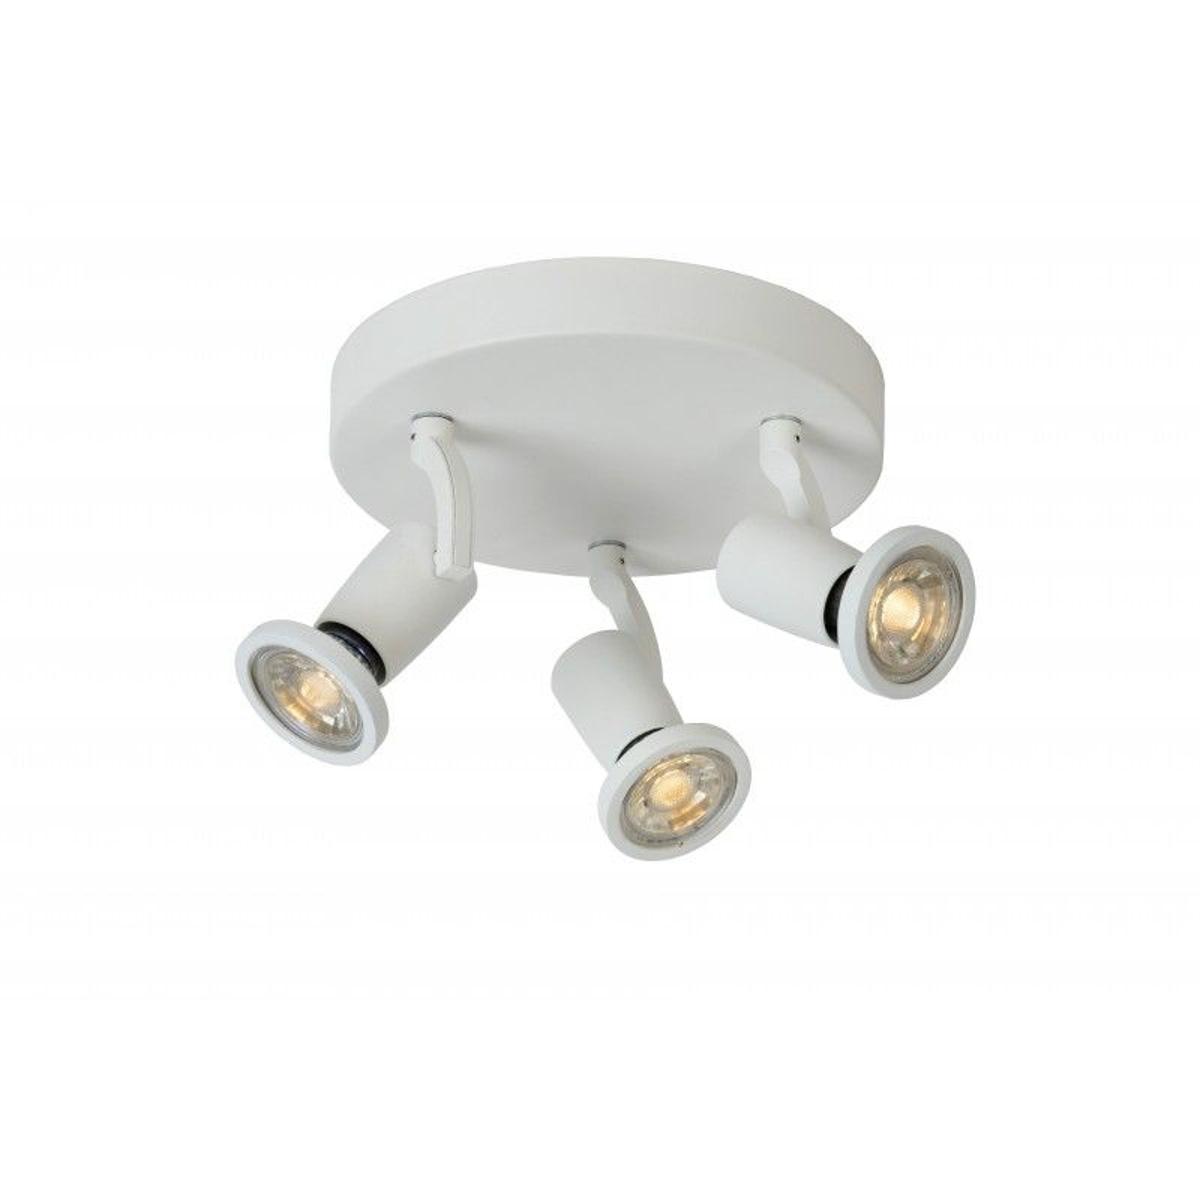 Spot Plafond Jaster LED - D20 cm - LED - GU10 - 3x5W 2700K